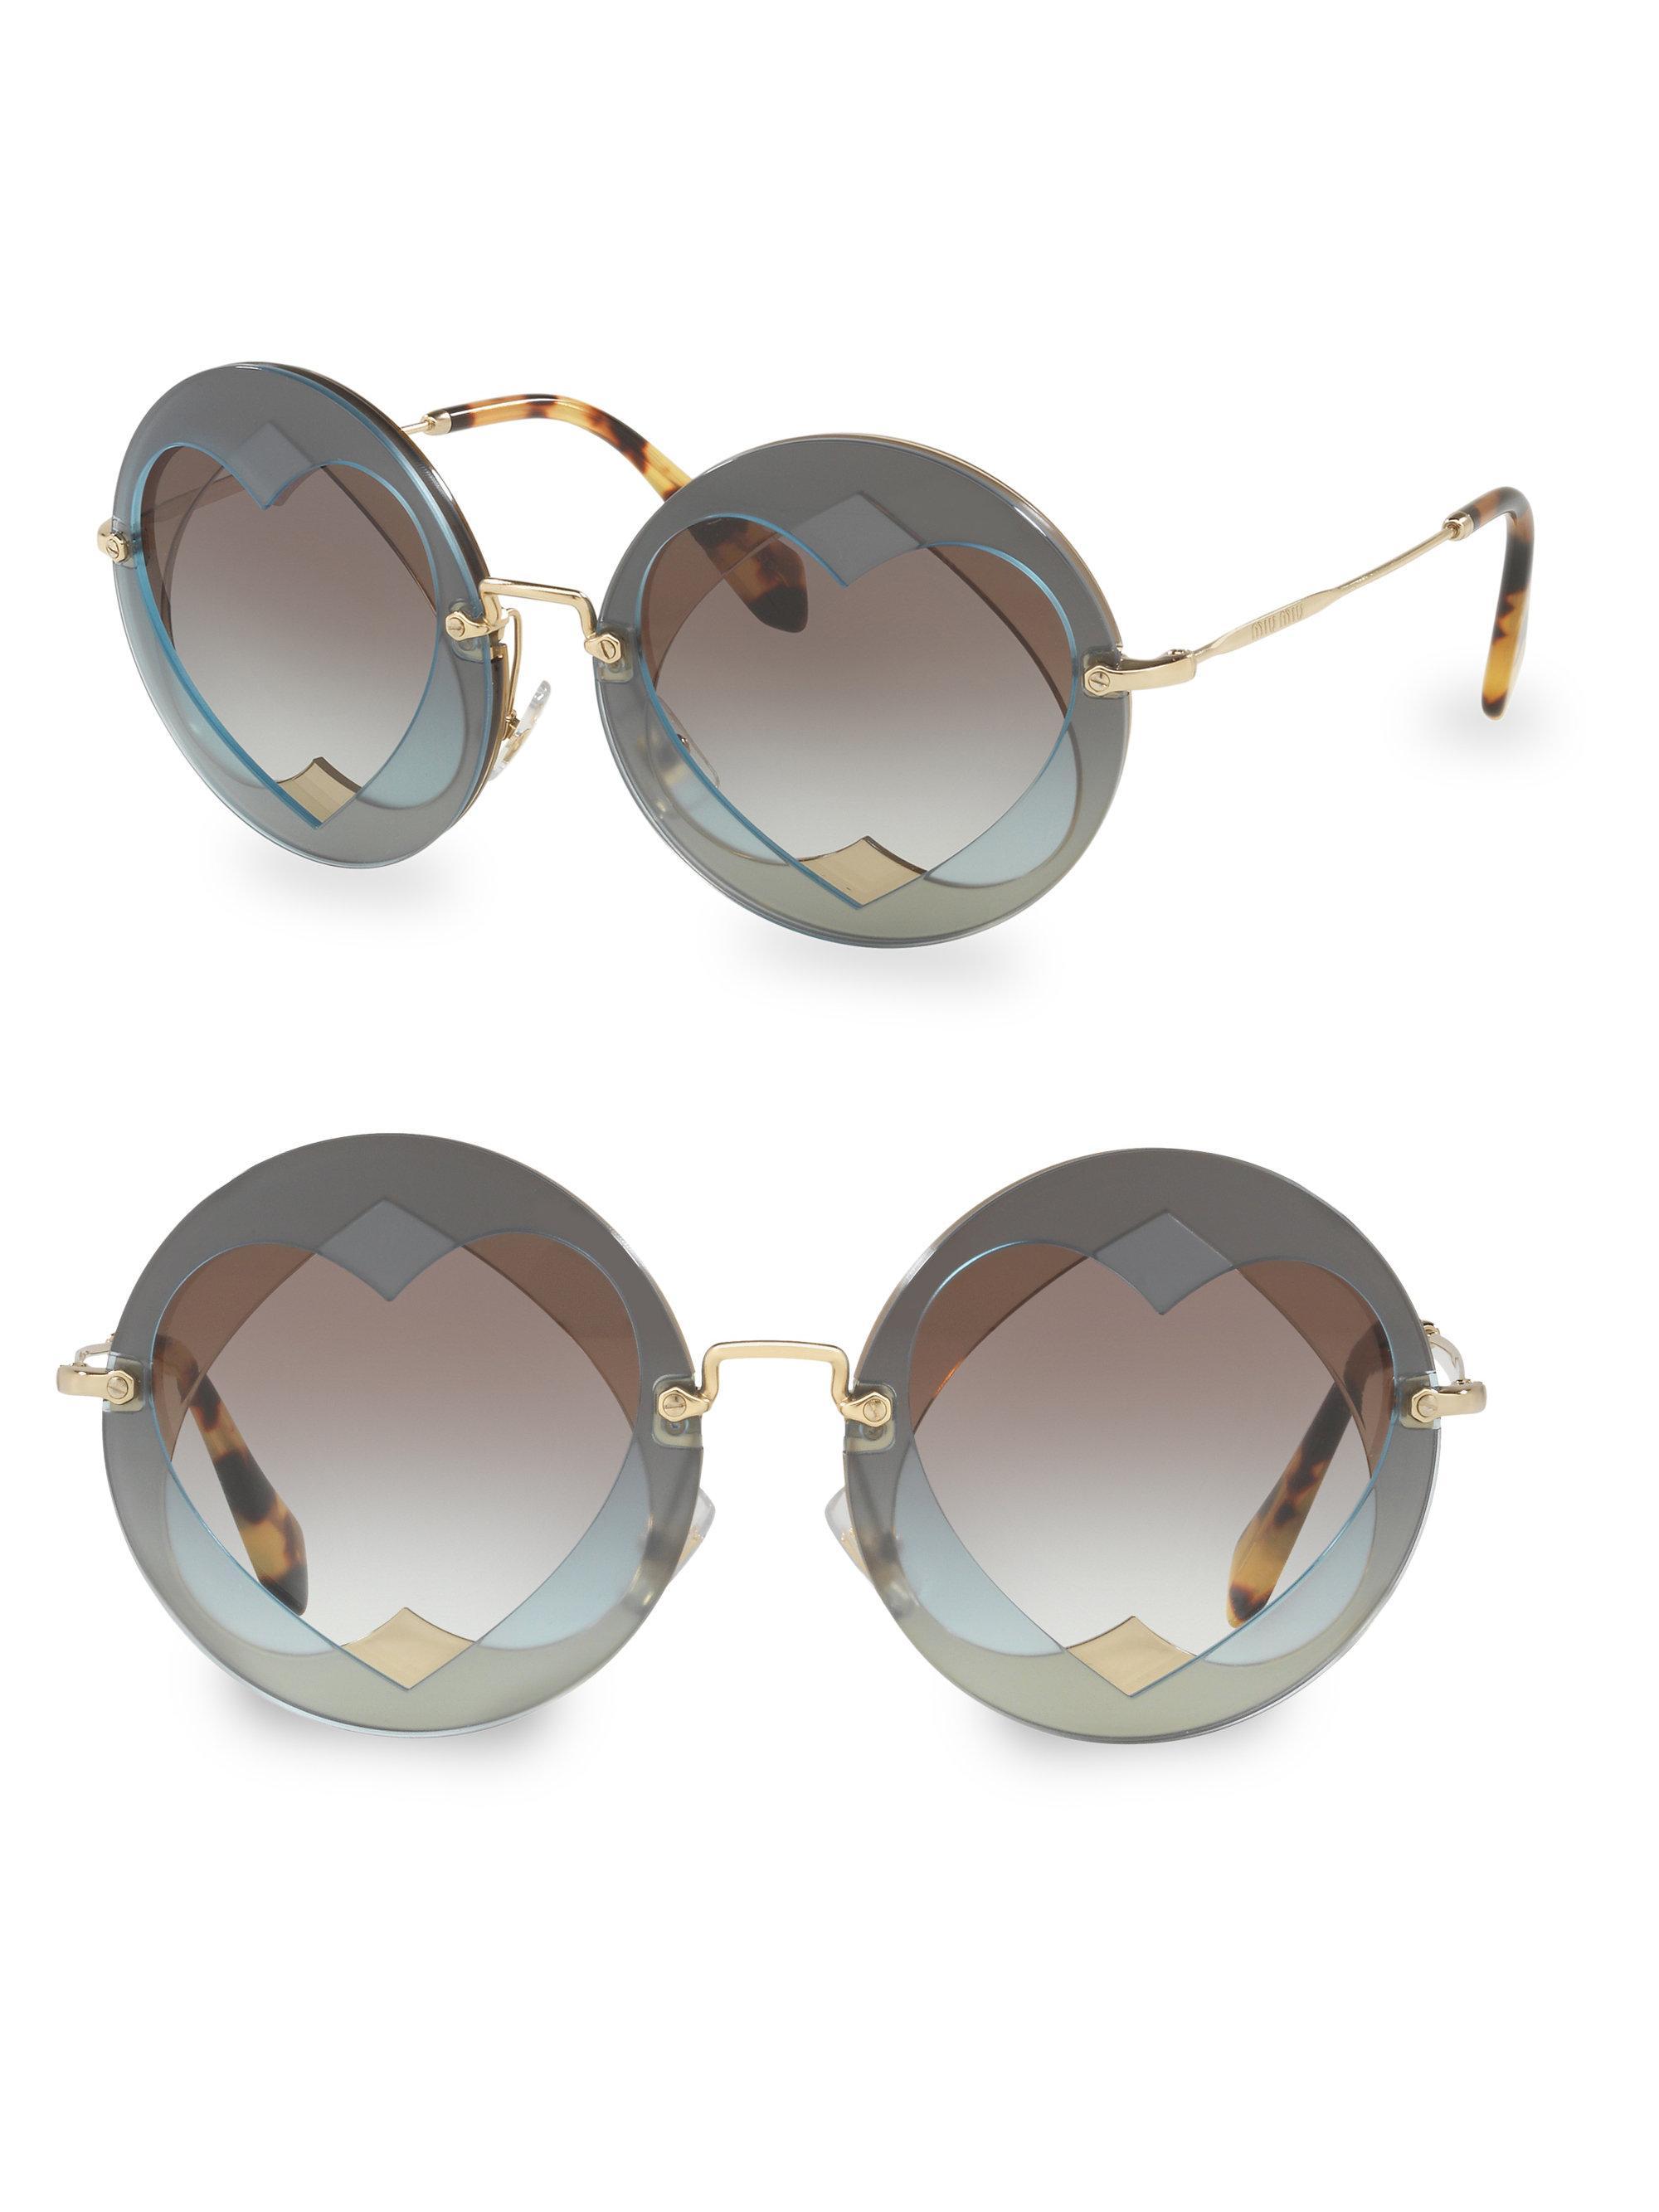 8373ec324091d Lyst - Miu miu Injected Woman  39 s 62mm Round Sunglasses ...